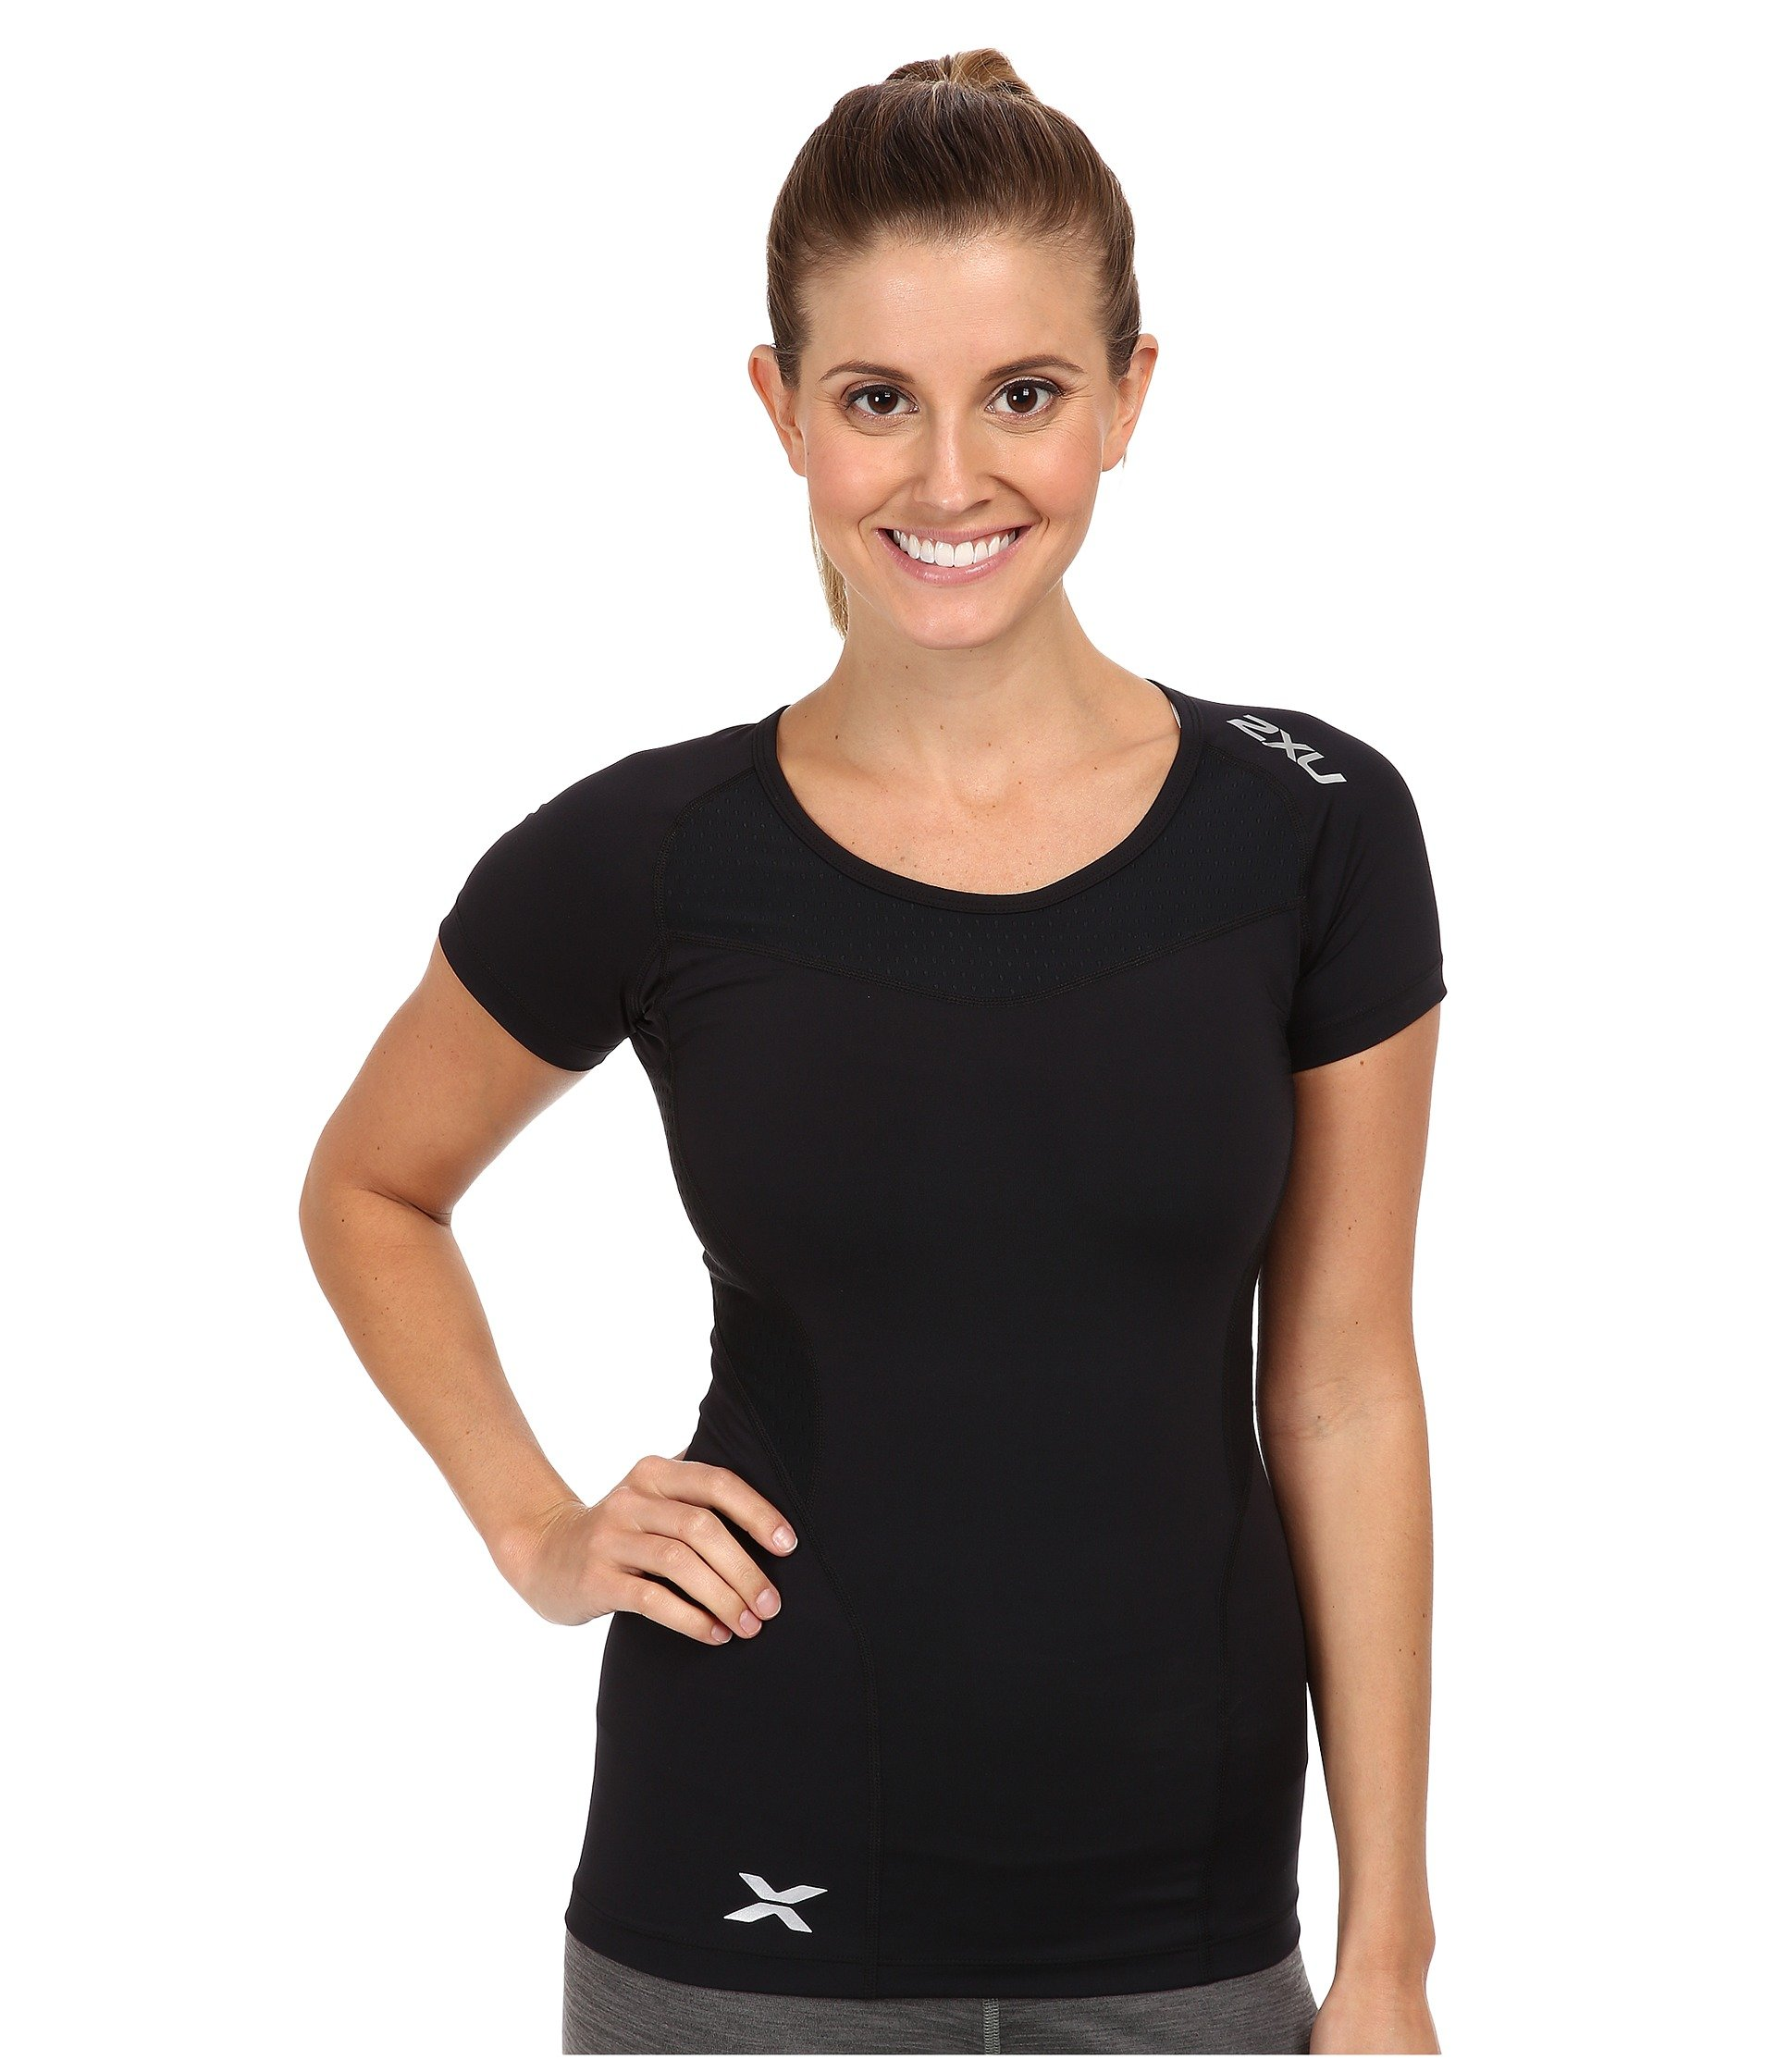 2XU Compression S/S Top Black/Black Women's Running T-Shirts 8397746